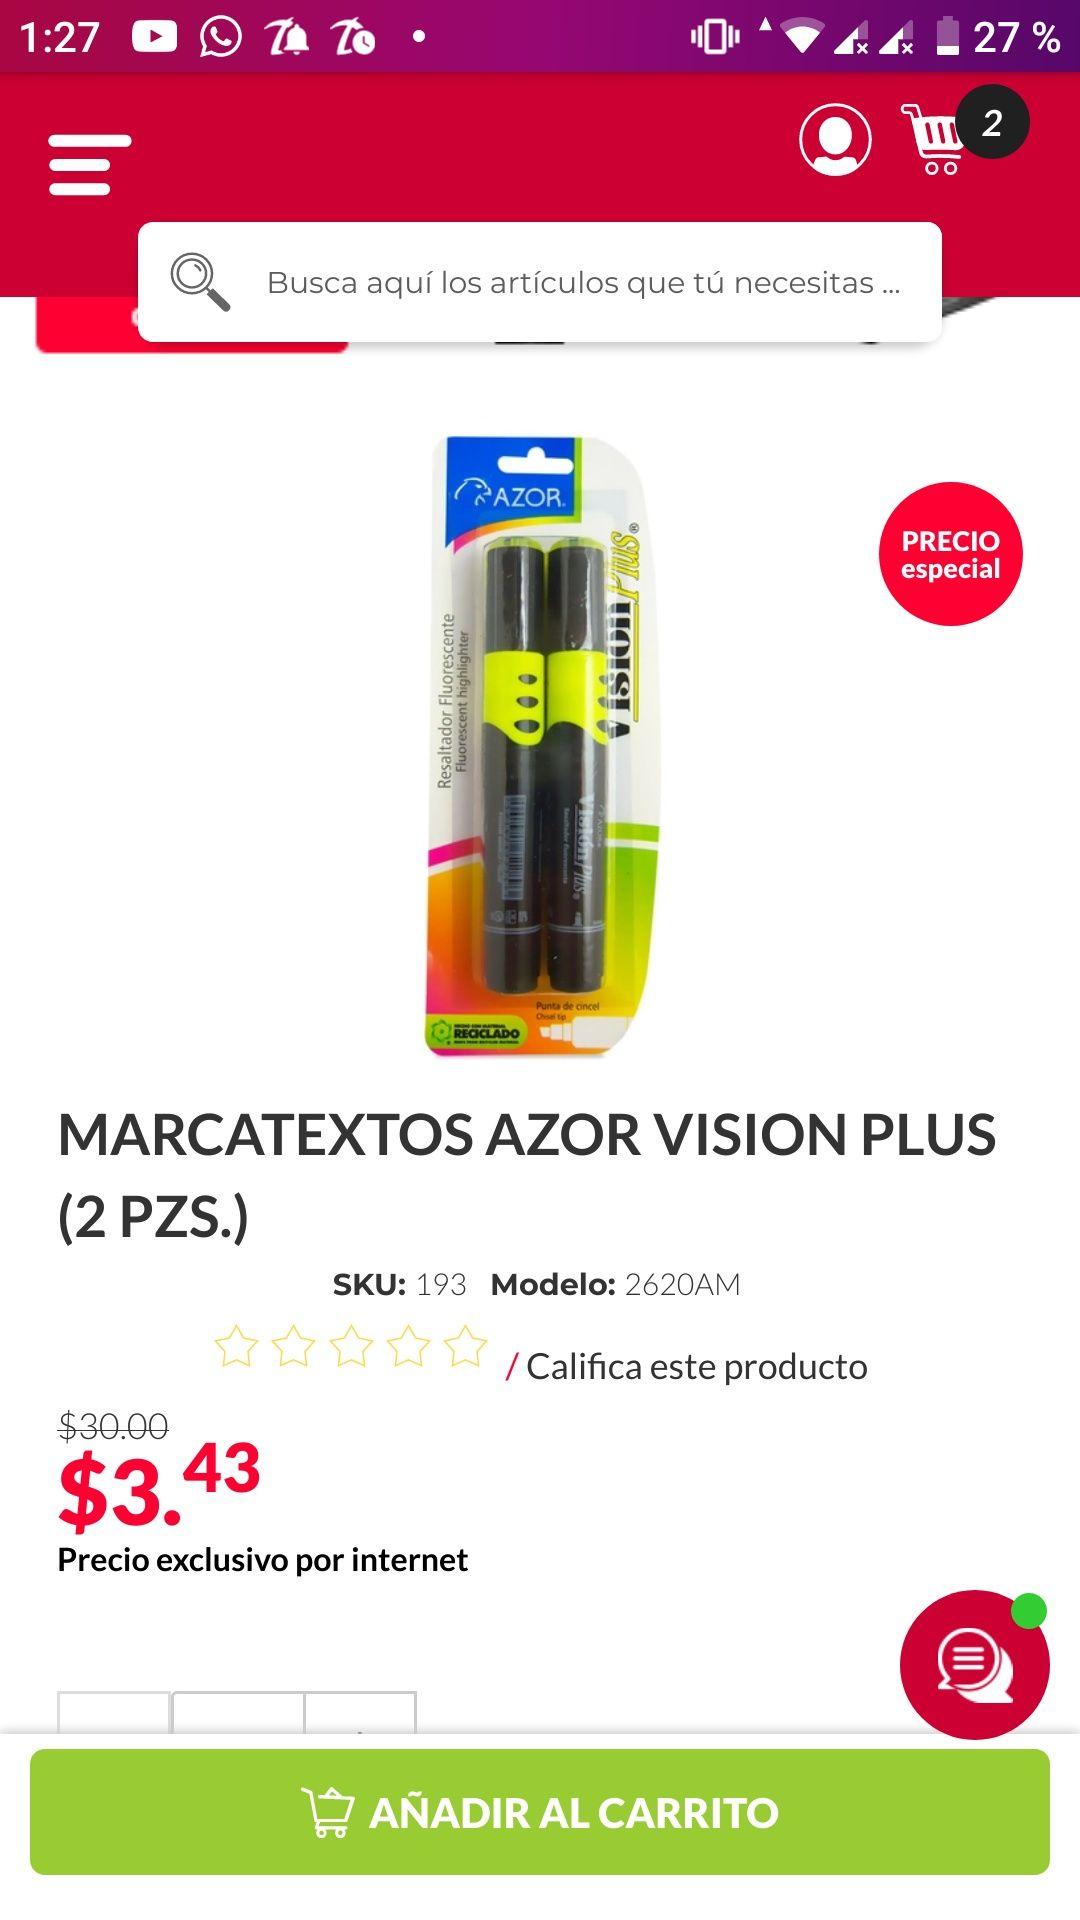 OFFICE DEPOT: MARCATEXTOS AZOR VISION PLUS (2 PZS).